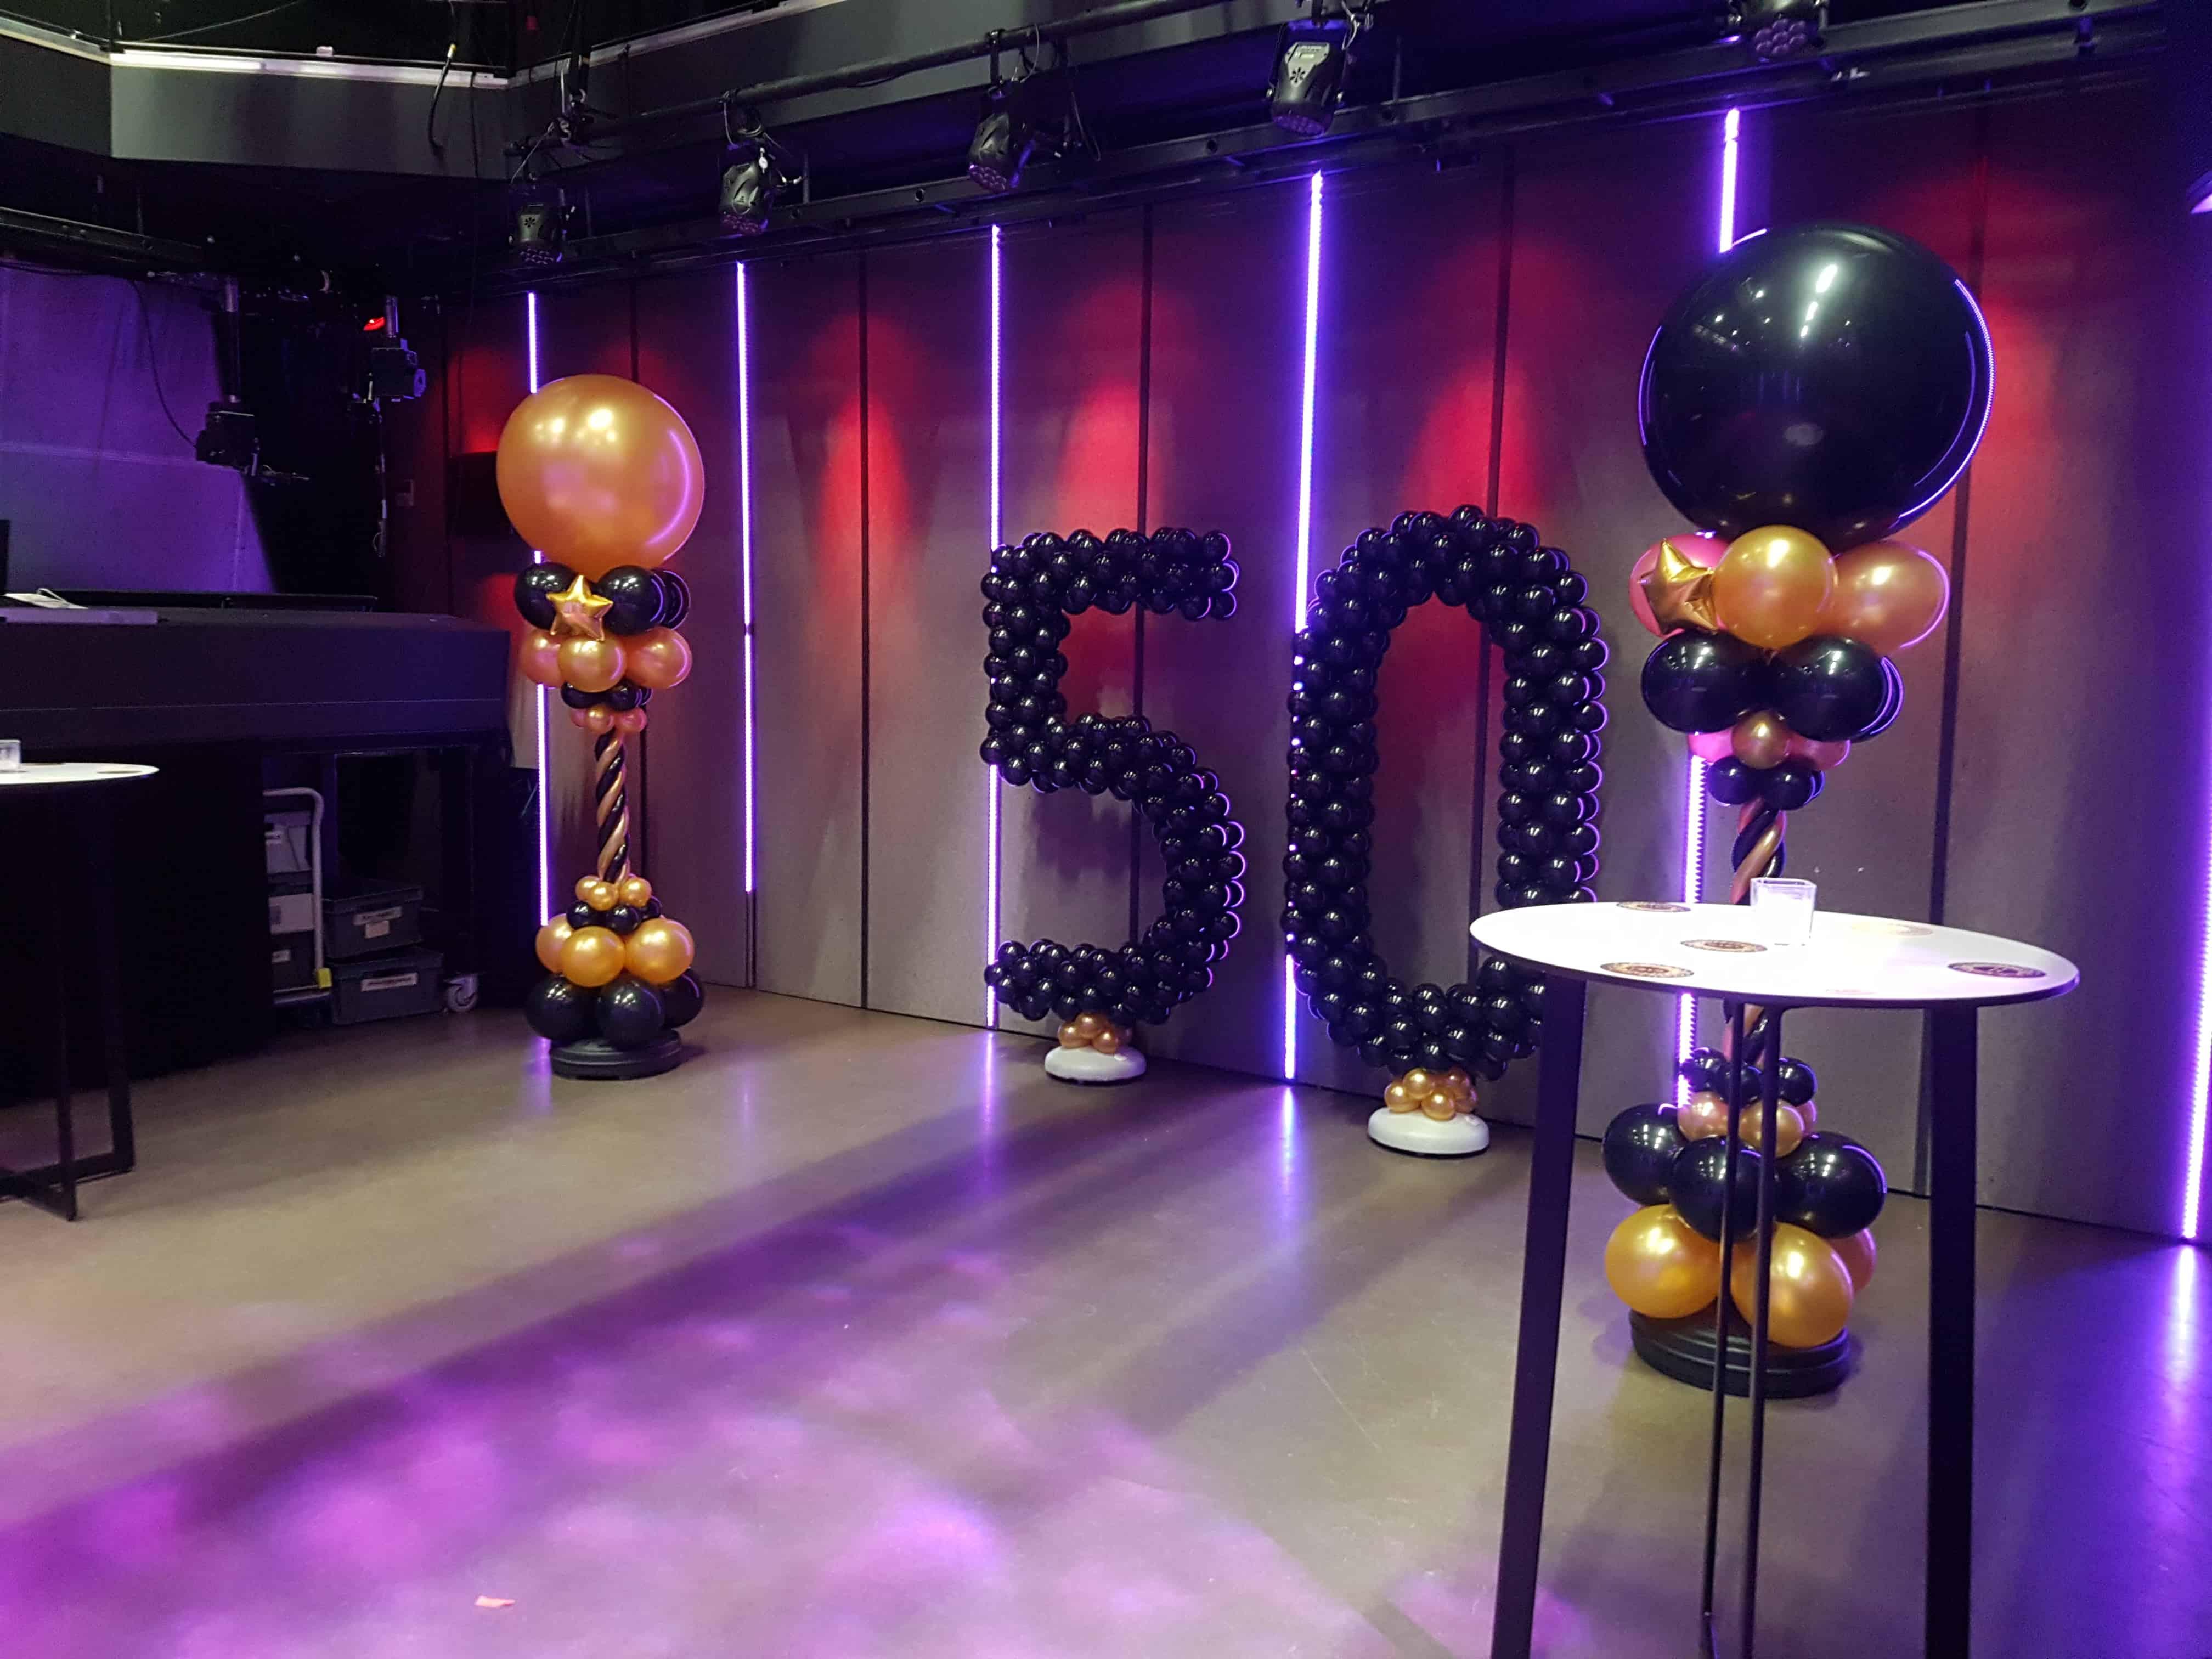 verjaardag-50-jaar-cijfer-ballonpilaar-balloncijfer-Amsterdam-De-Decoratieballon-glamour-glitter-stijl-zwart-goud-ballonnen